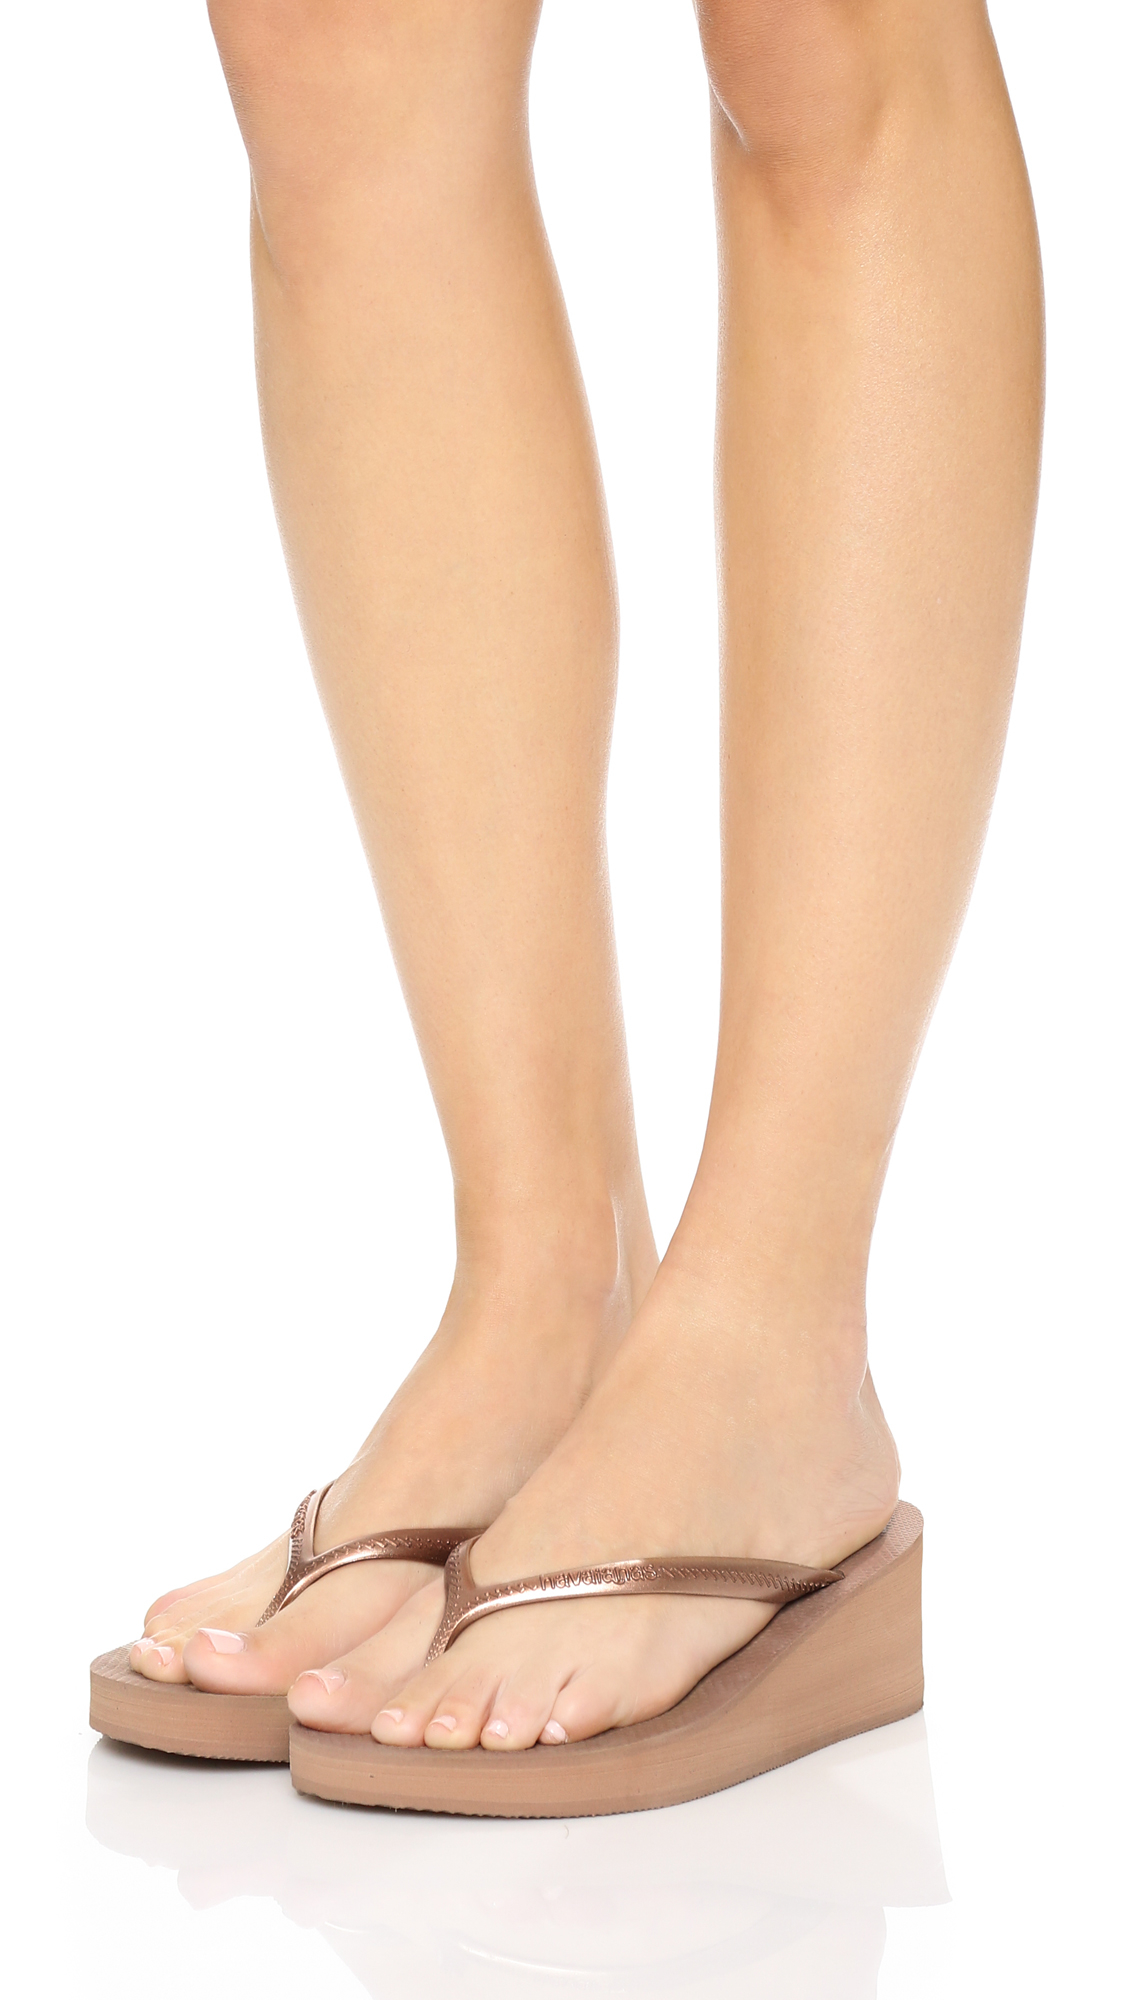 9121cdd6e536be Lyst - Havaianas High Fashion Wedge Flip Flops